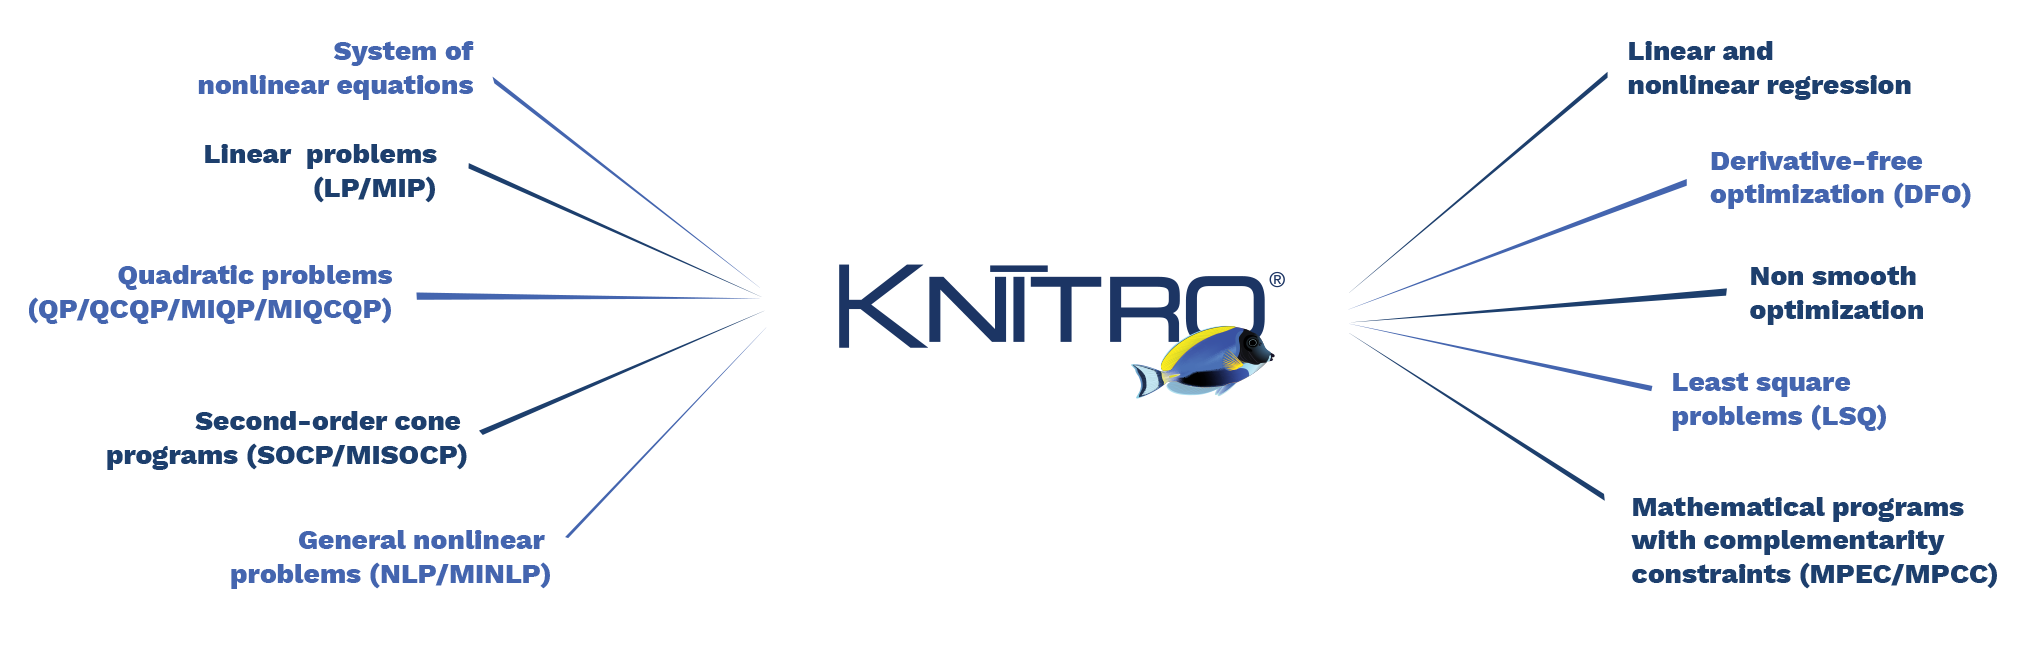 Knitro - Artelys